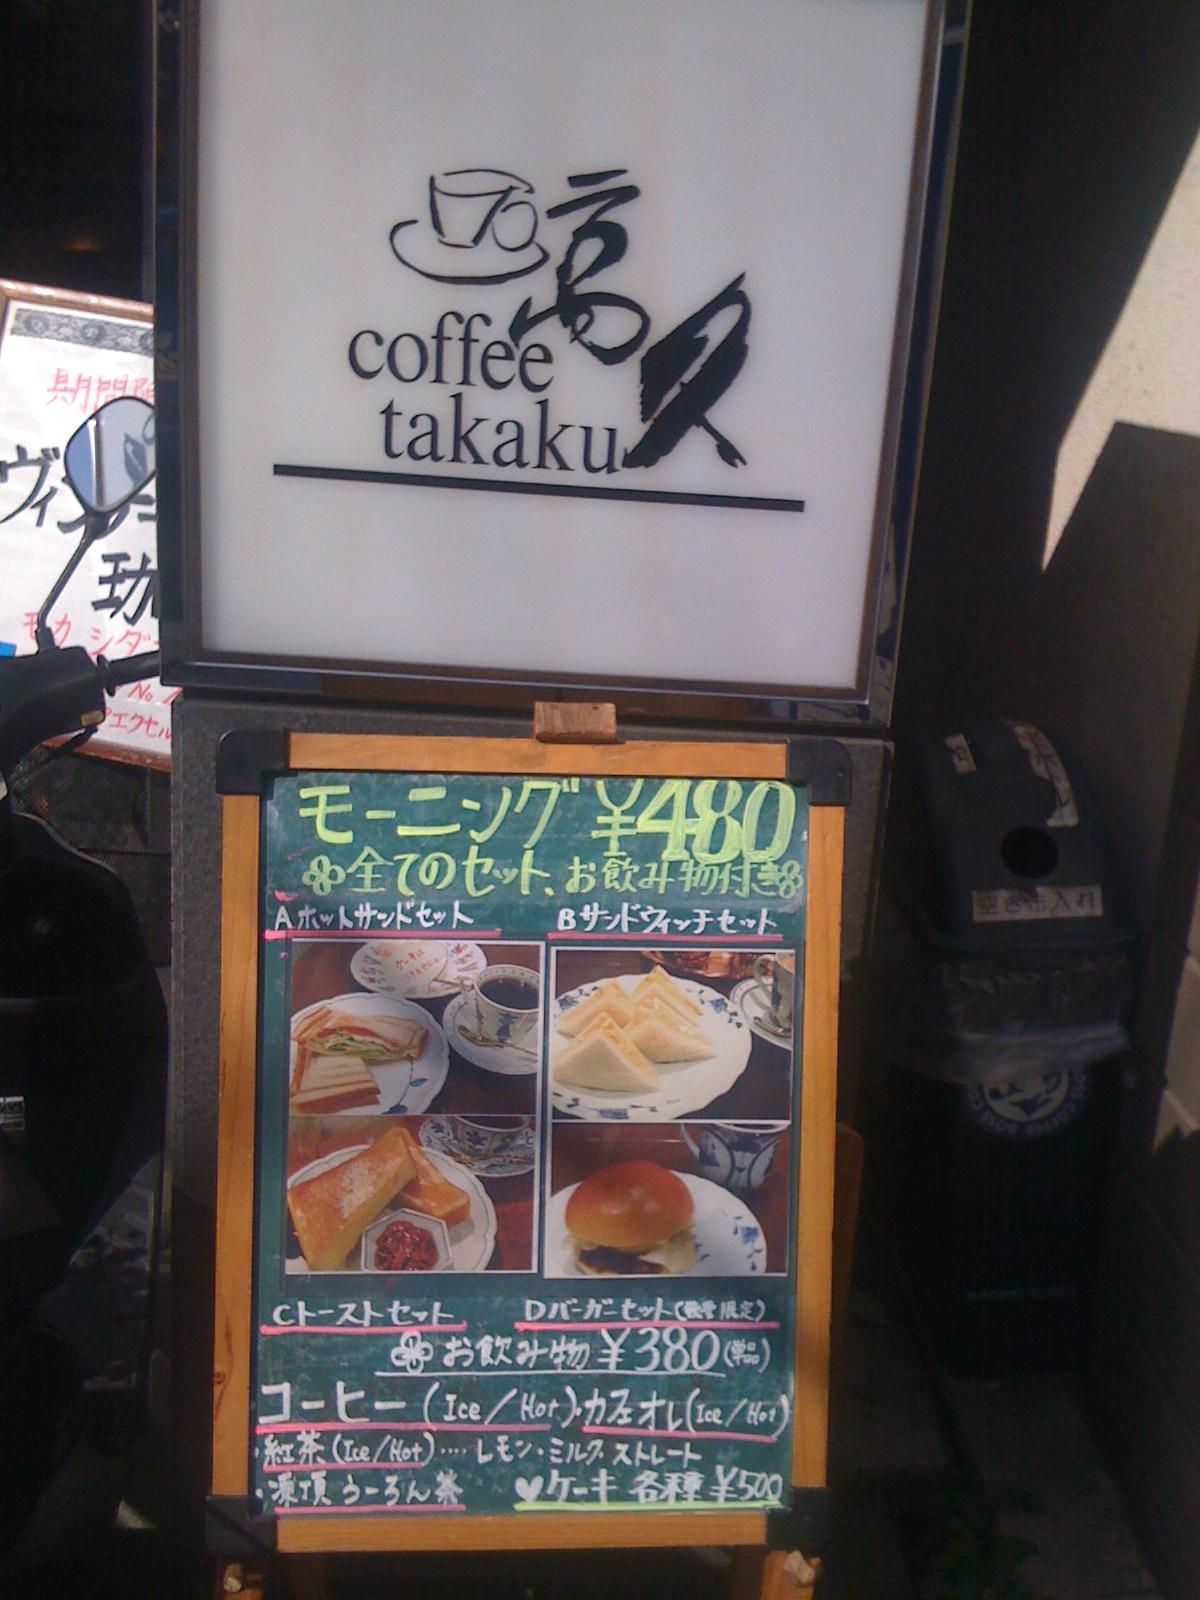 coffee 高久(たかく 人形町)